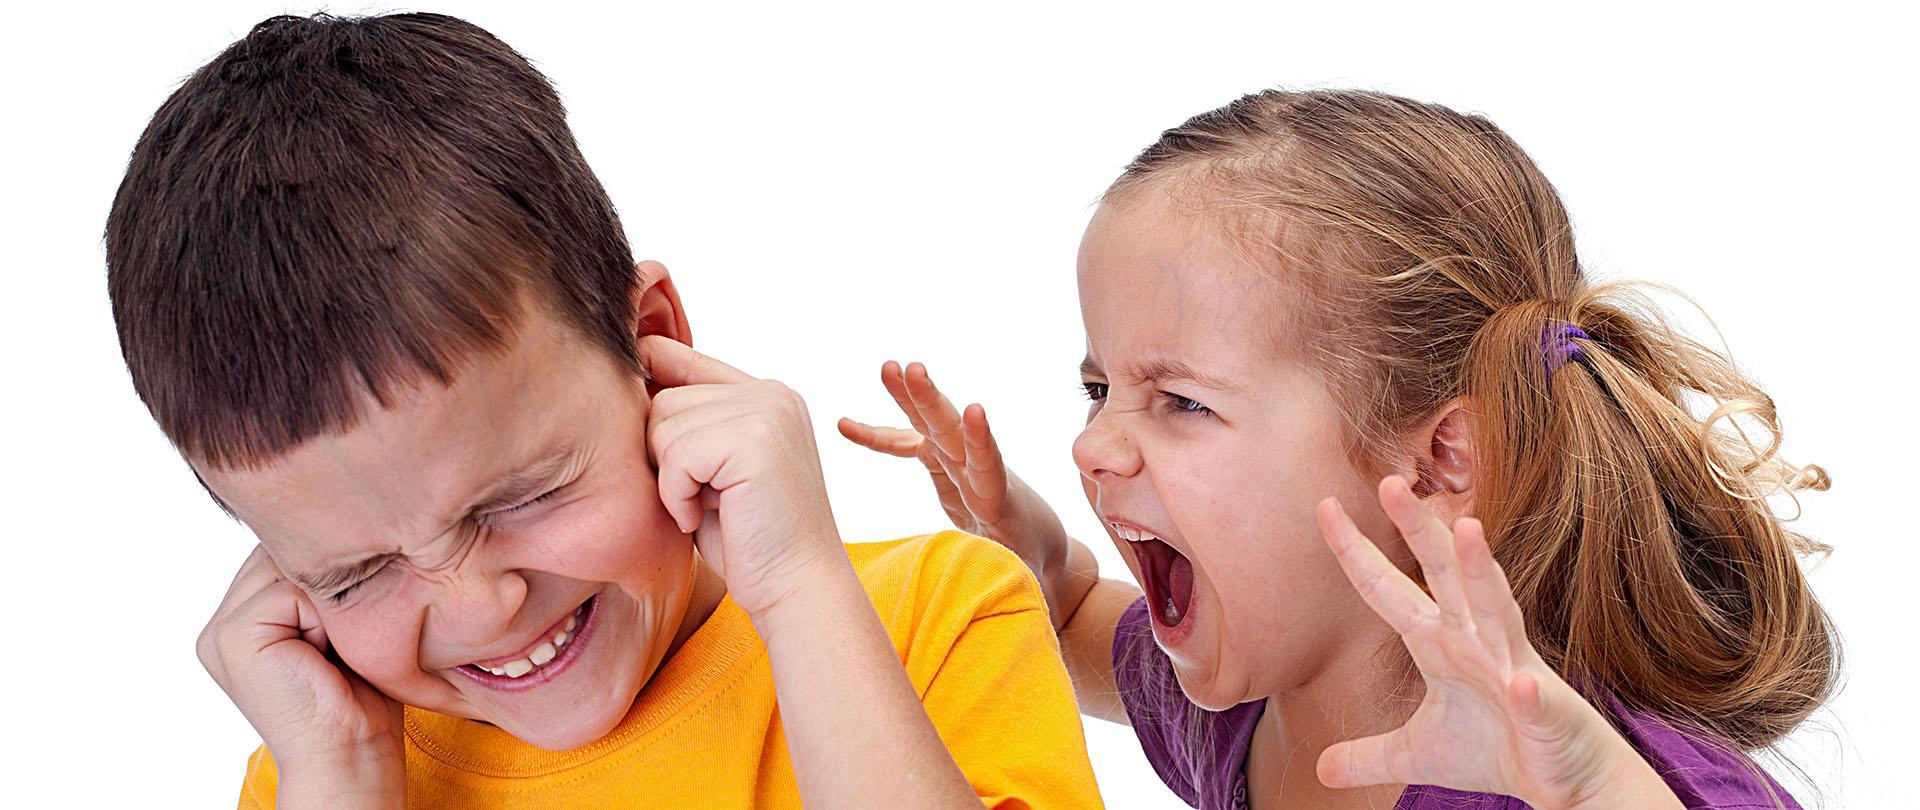 Агрессия при аутизме